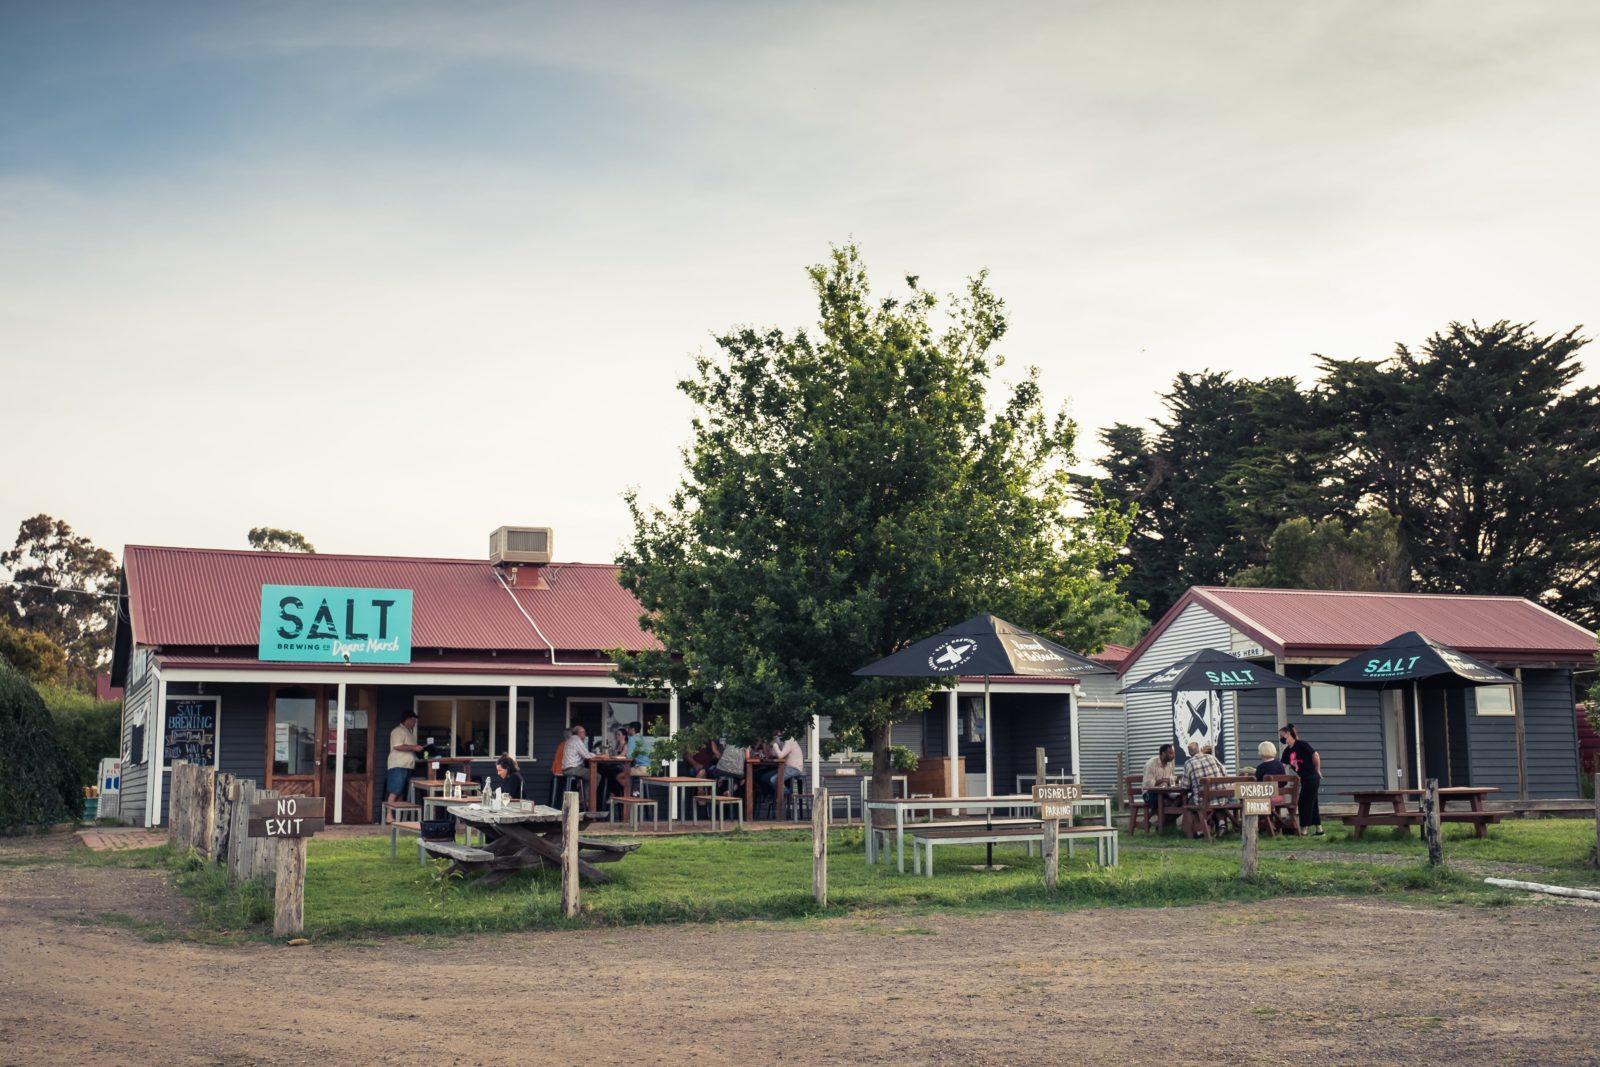 Image of Salt Brewing beer garden and entrance